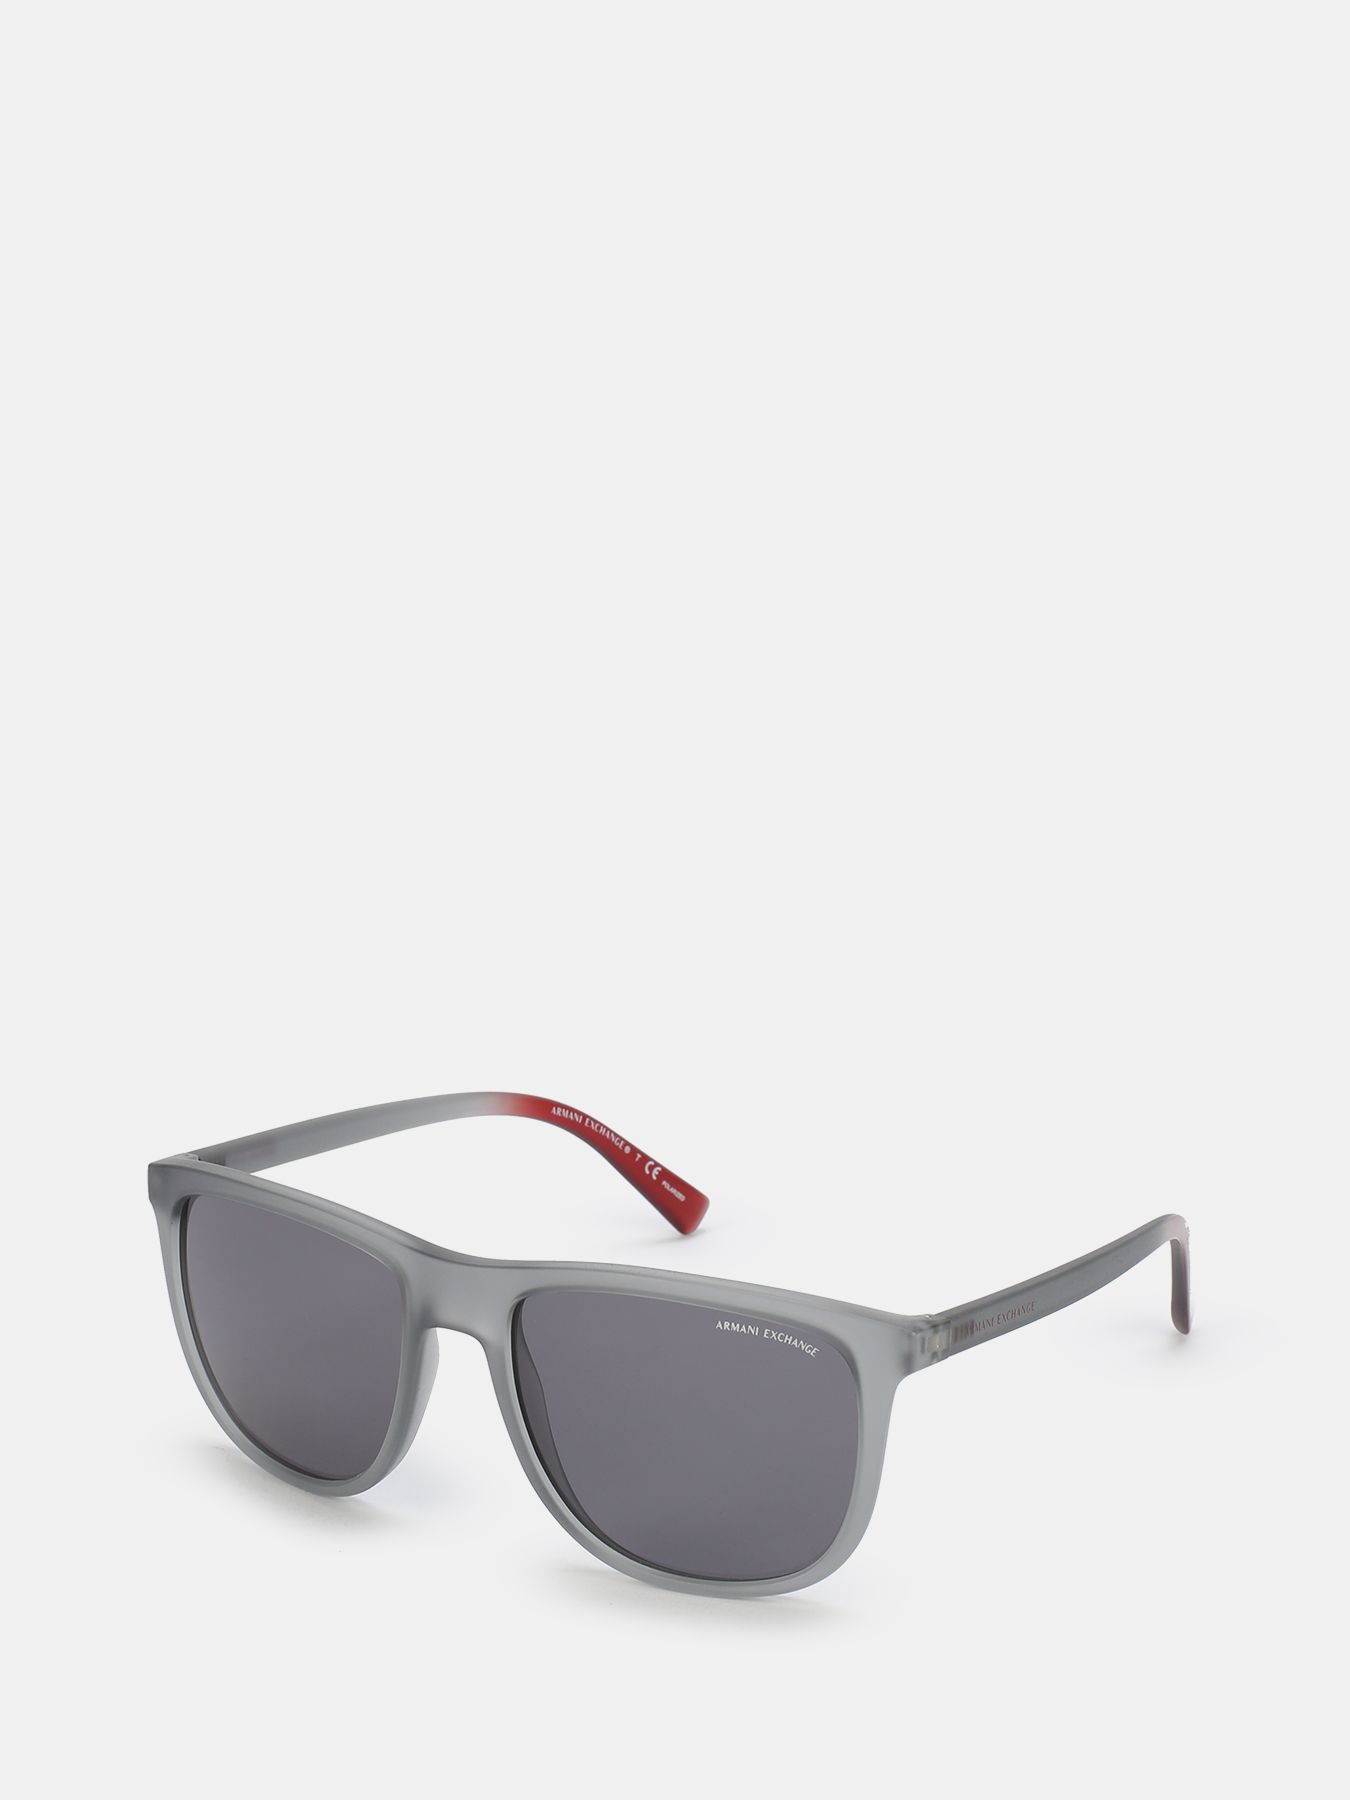 Фото - Очки Armani Exchange Солнцезащитные очки очки солнцезащитные rapala sportsman s cap flip up rvg 085b